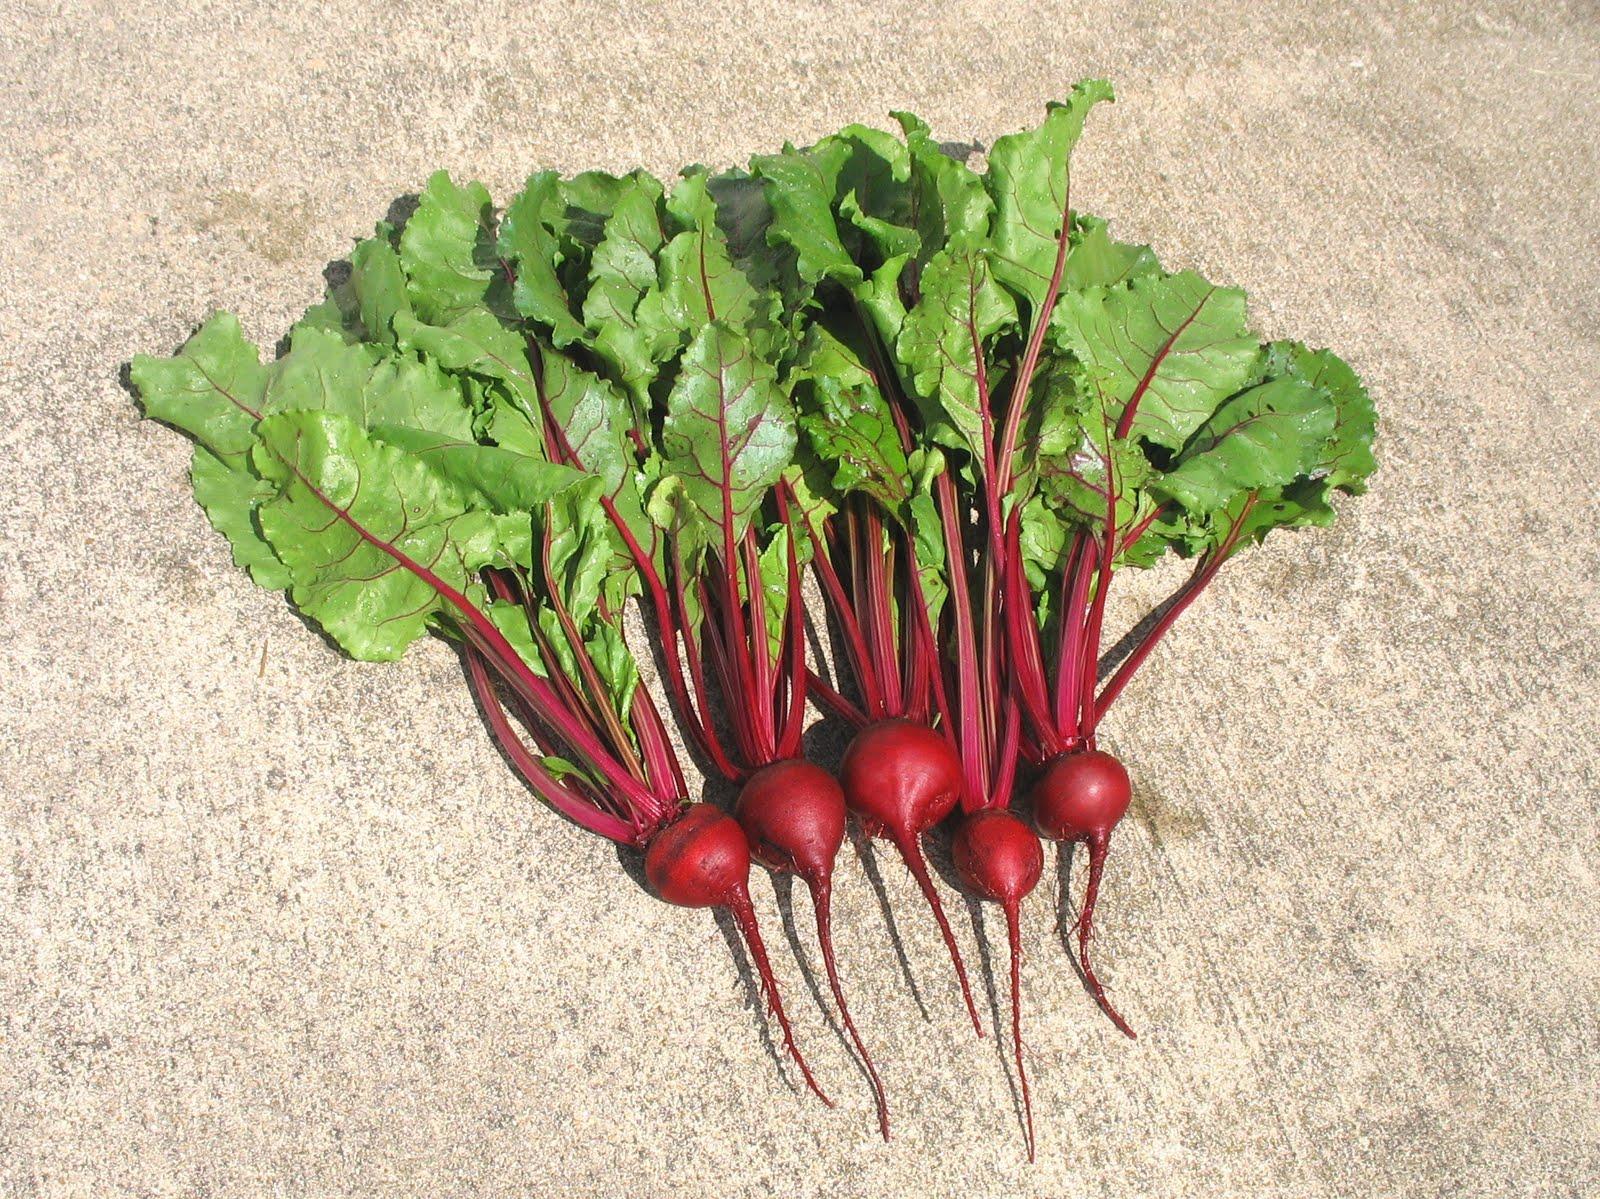 Larrys Weed Free Vegetable Garden First Beet Harvest